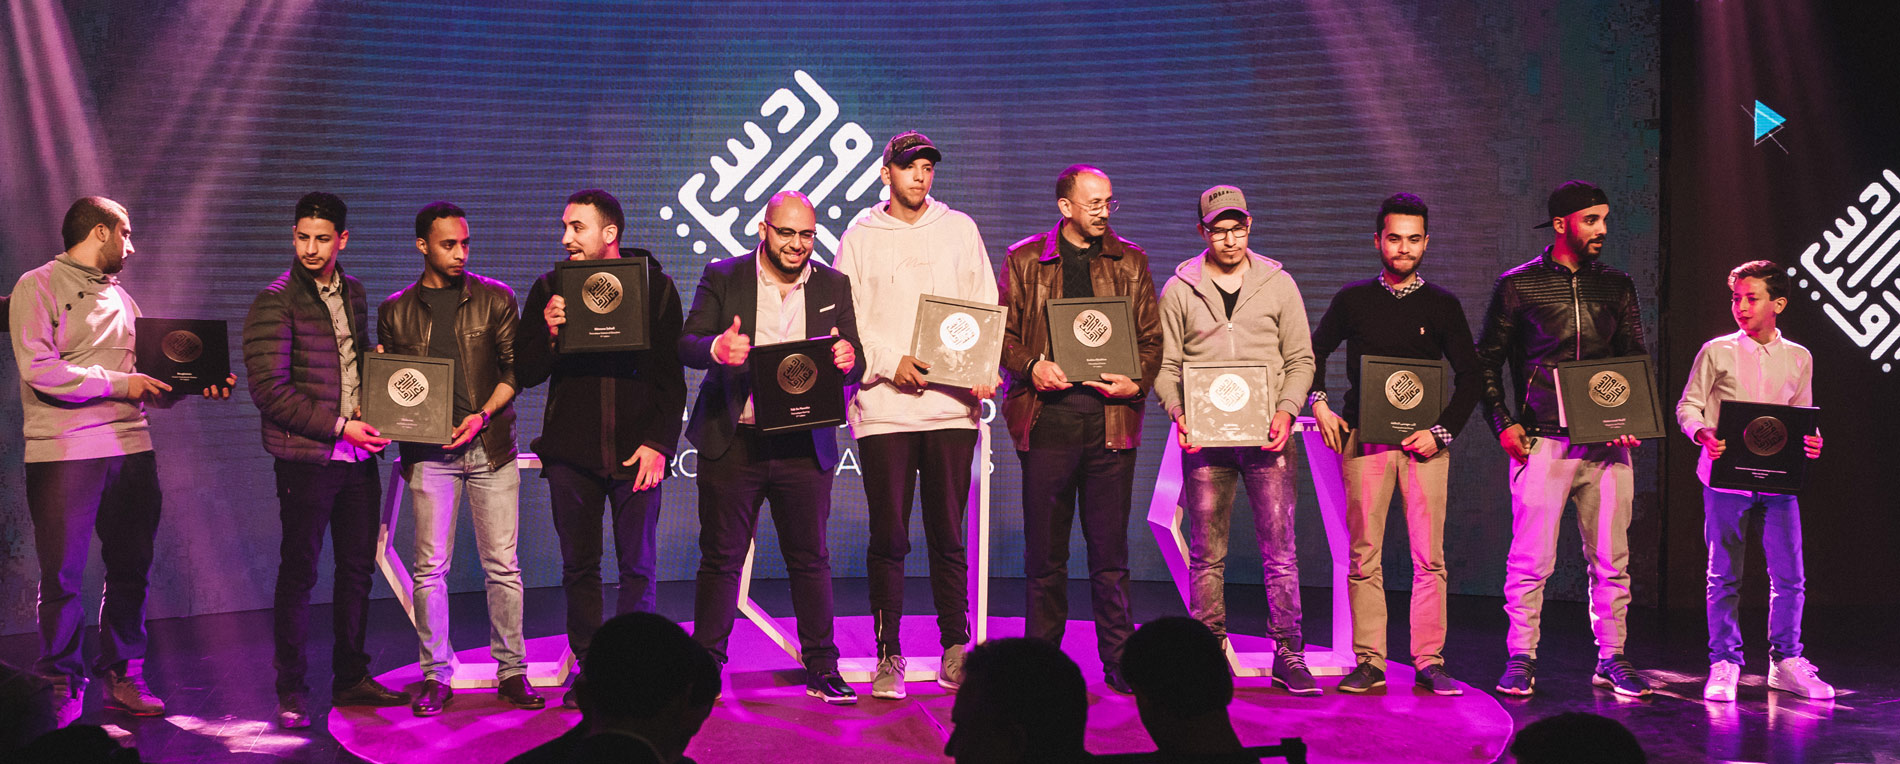 Maroc Web Awards - Gagnants #MWA11